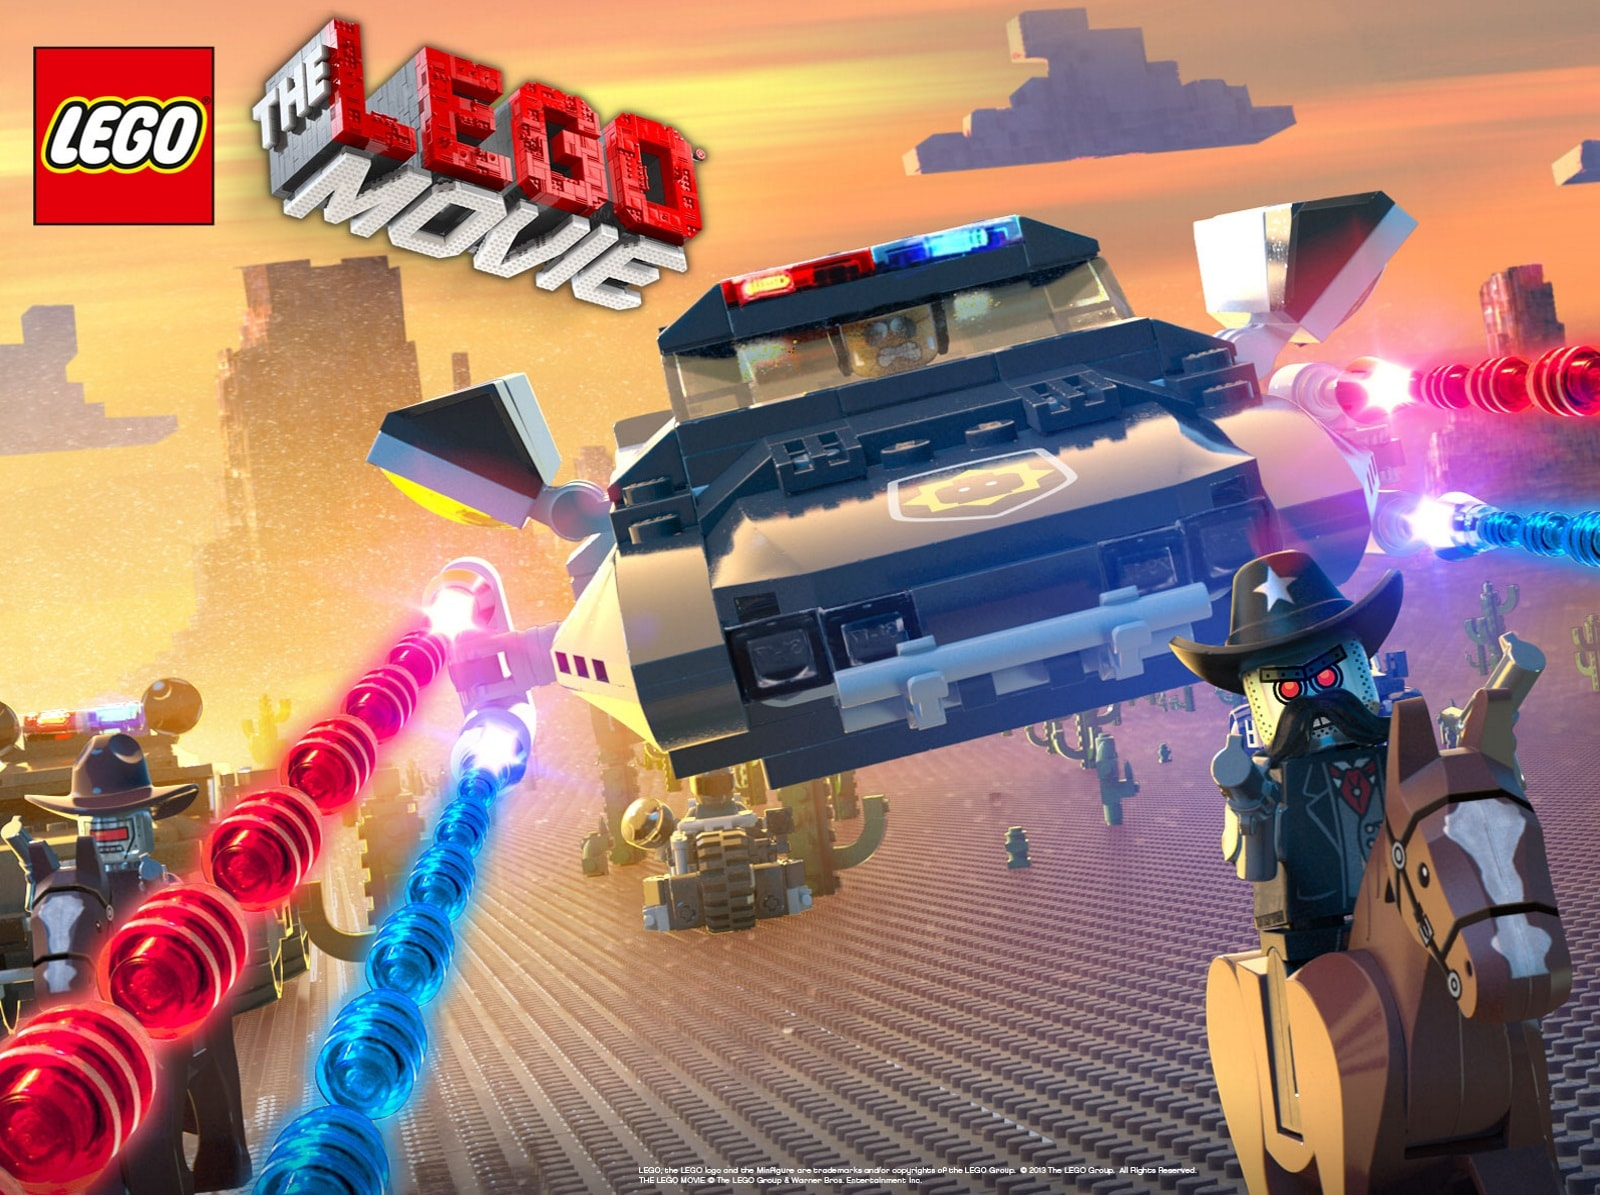 The Lego Movie High